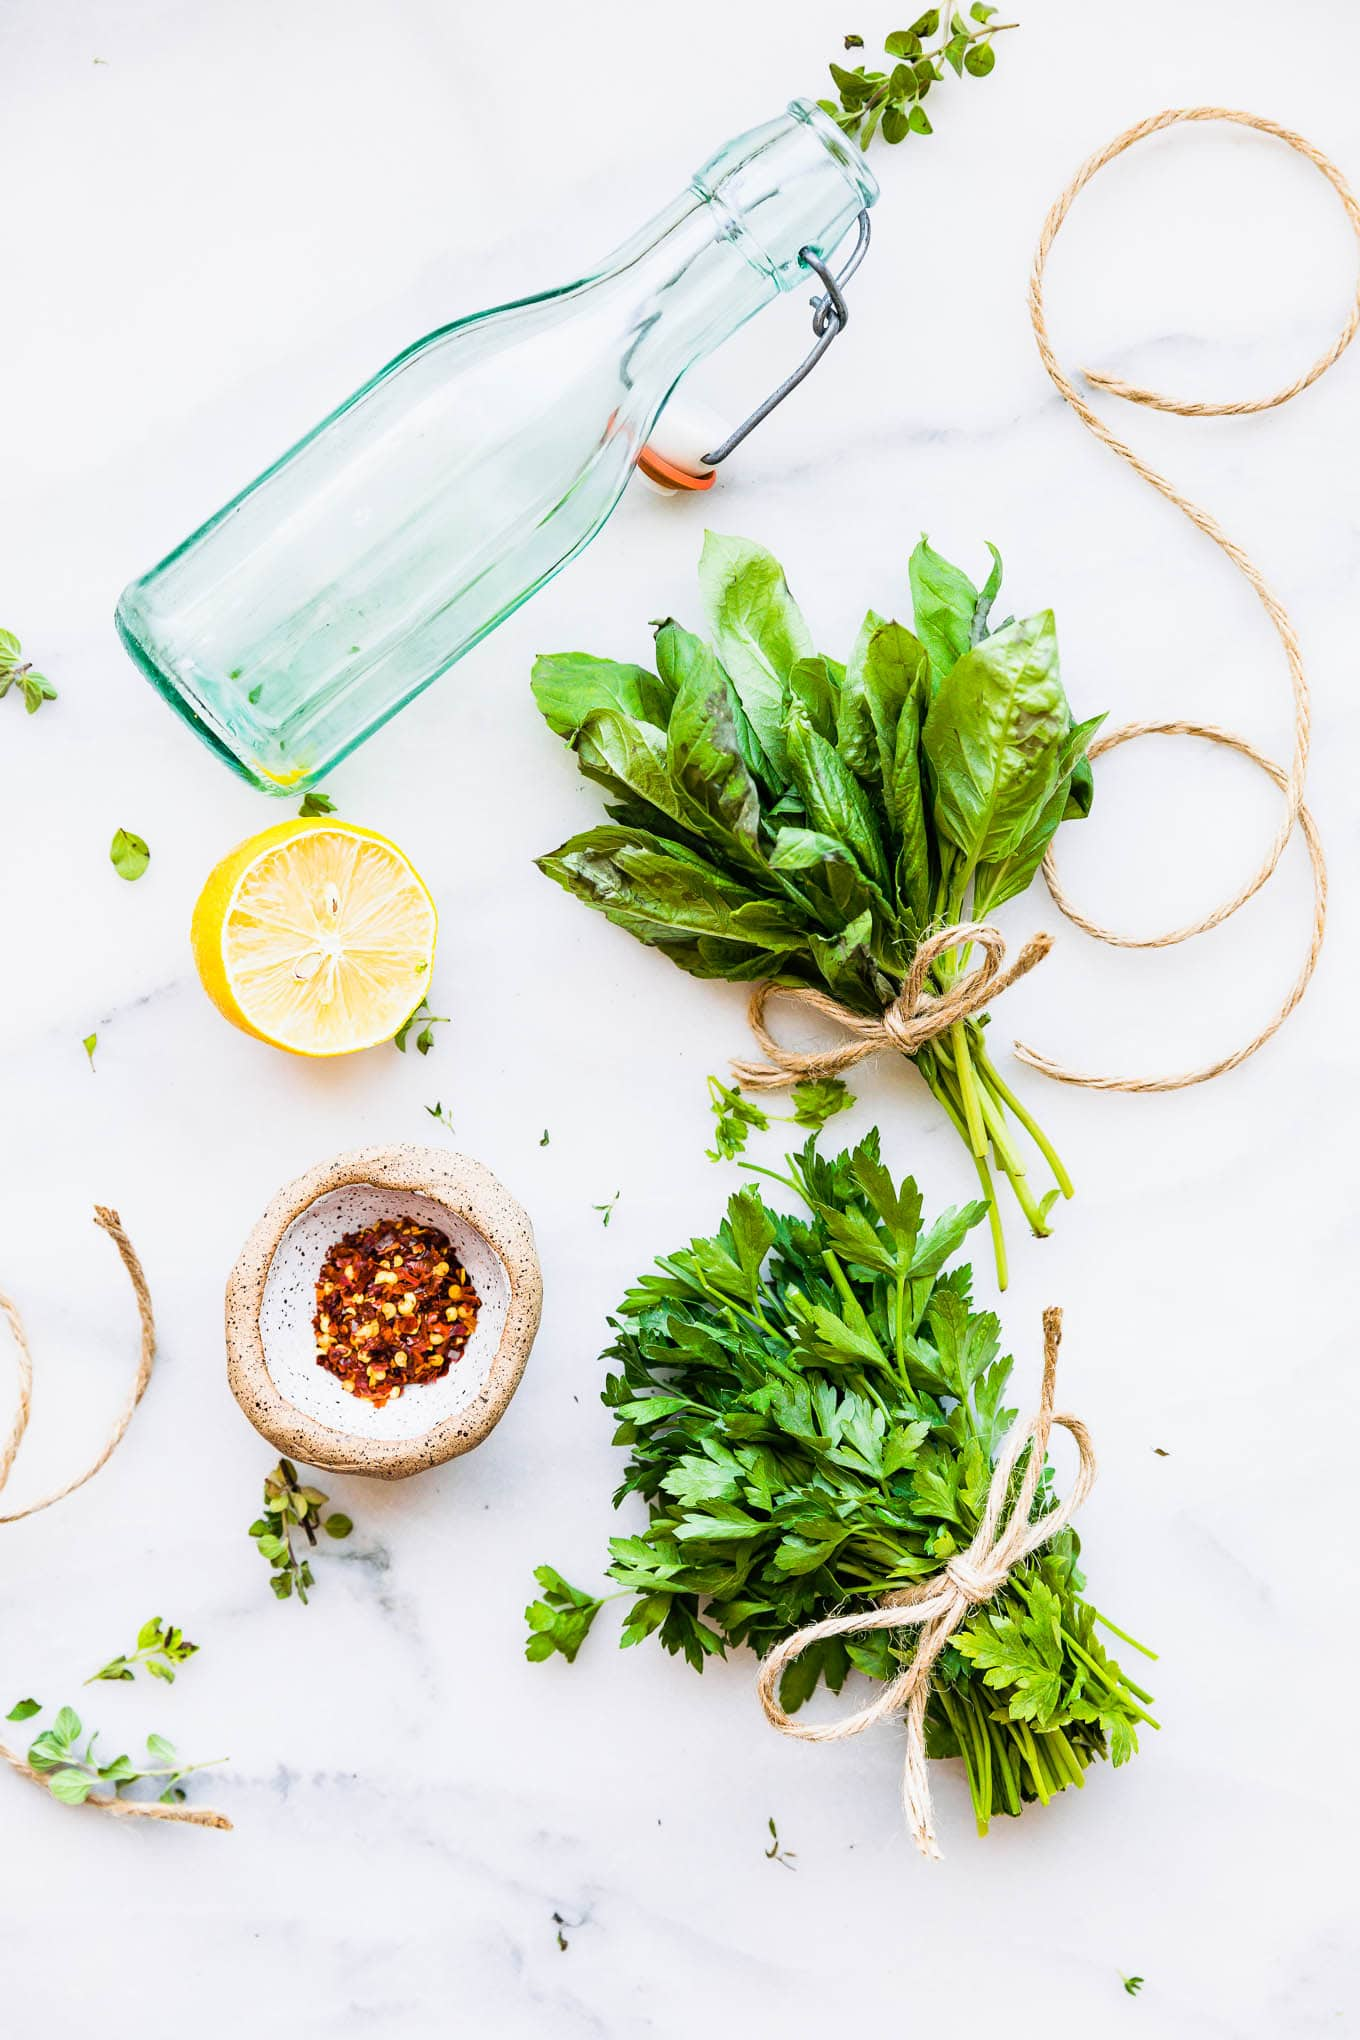 ingredients to make herb vinegar